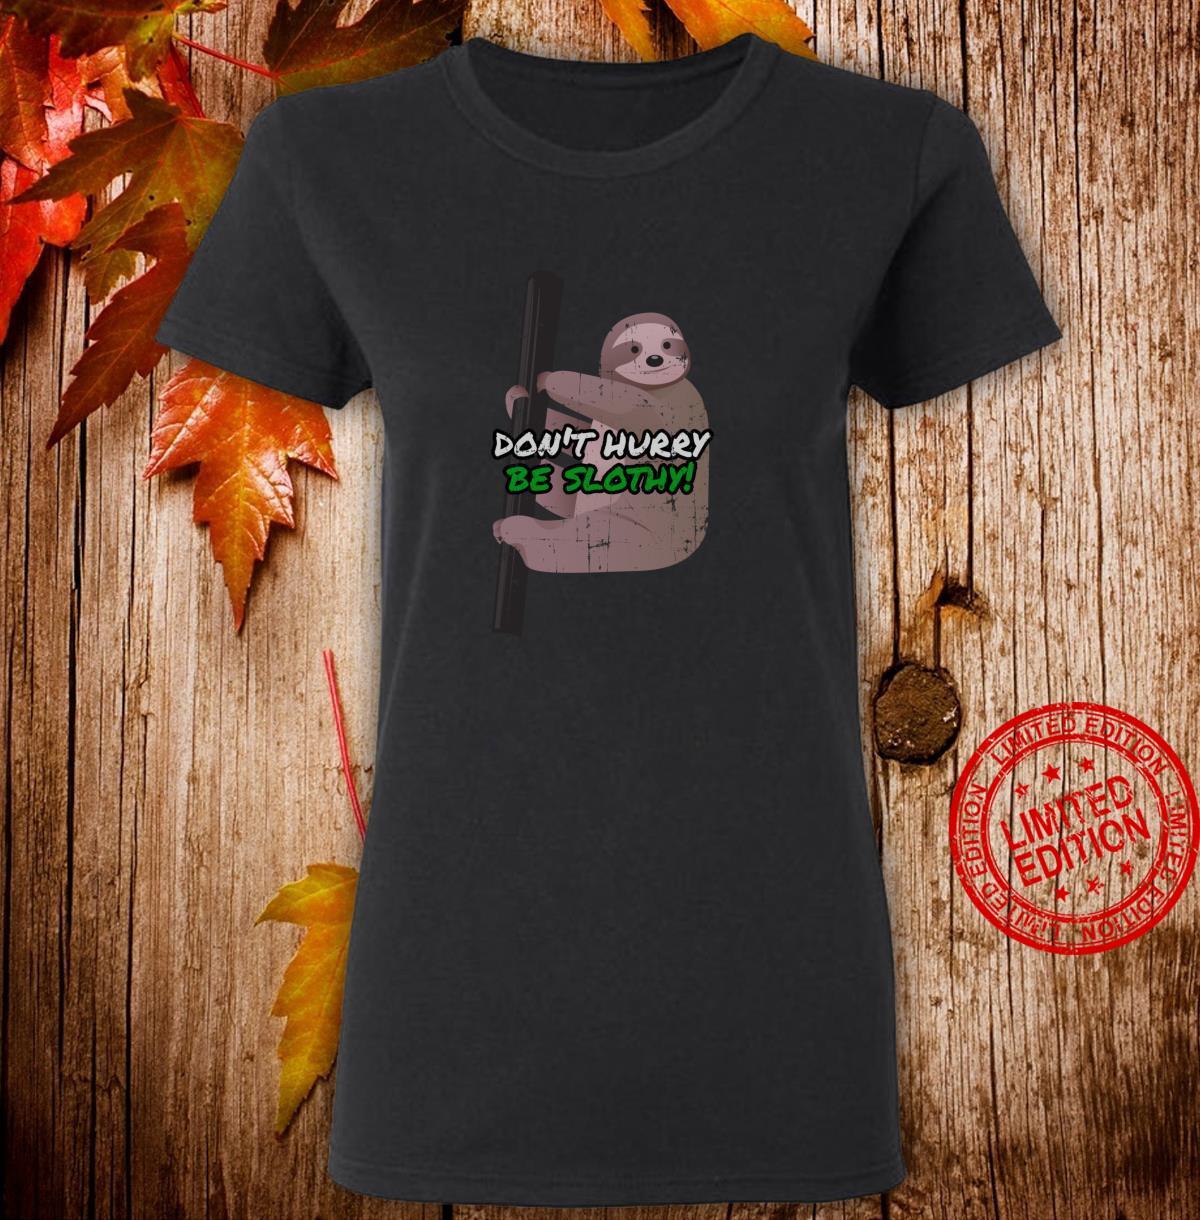 Funny Humorous Sloth Design Don't Hurry Be Slothy Shirt ladies tee